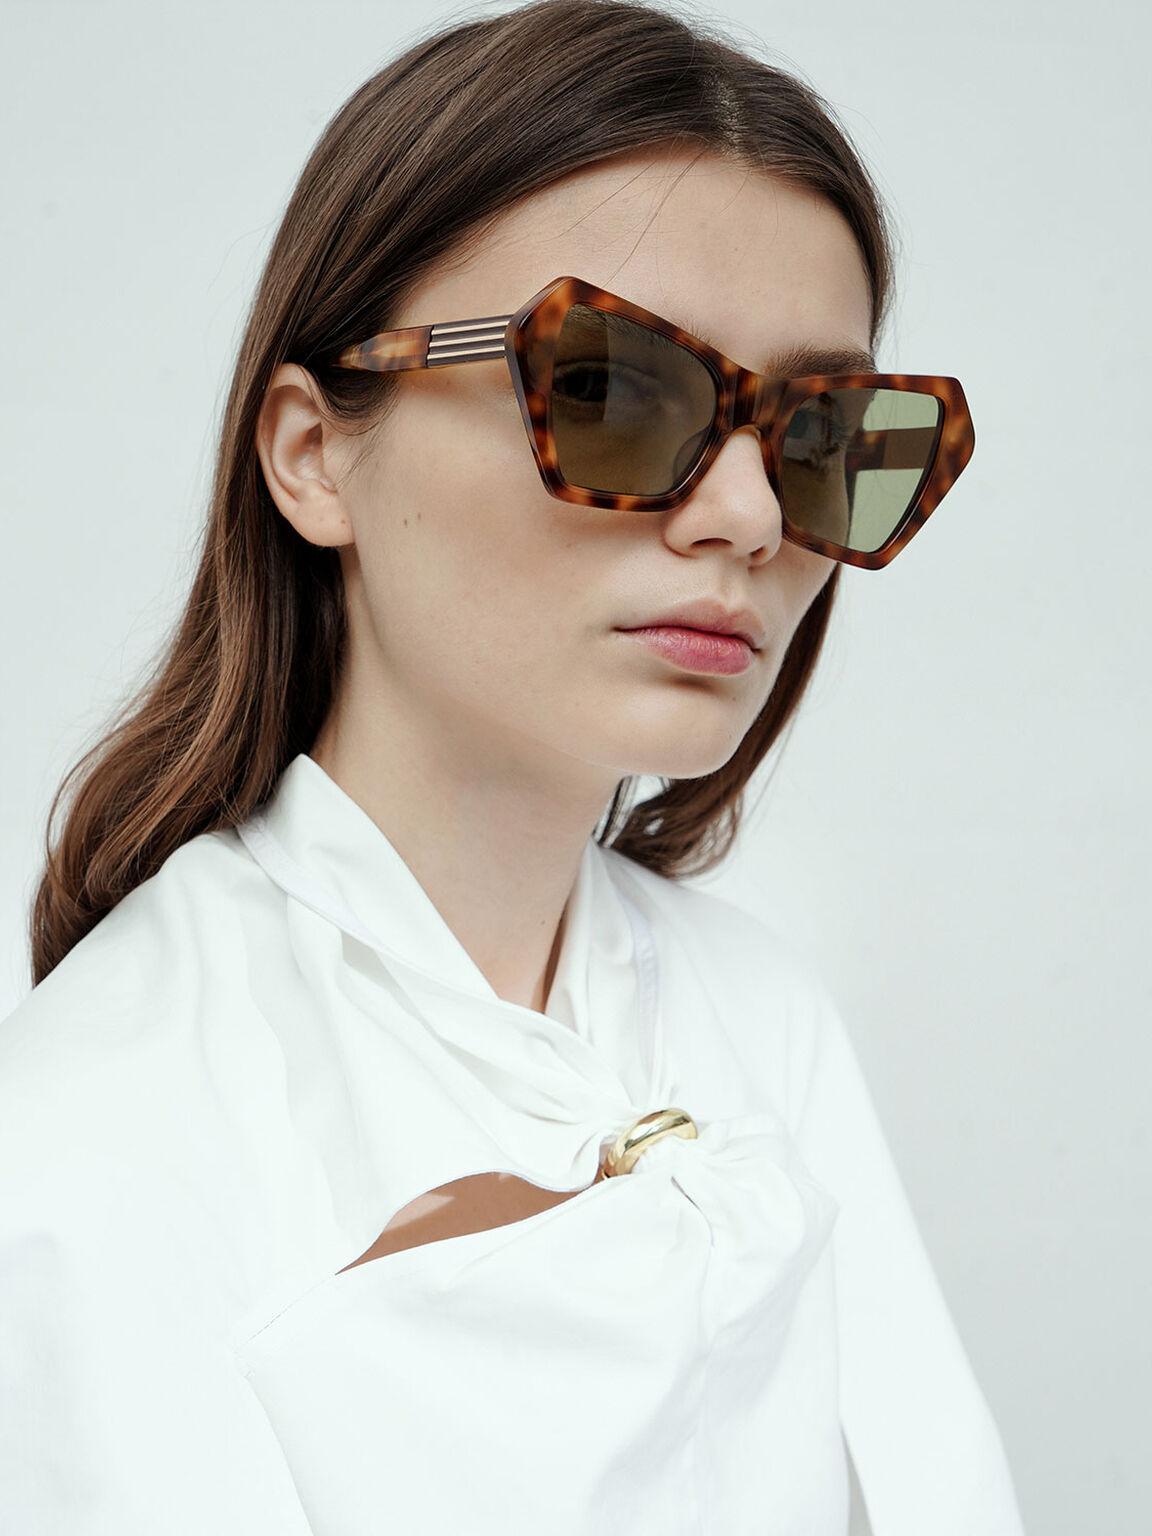 Geometric Frame Tortoiseshell Sunglasses, T. Shell, hi-res